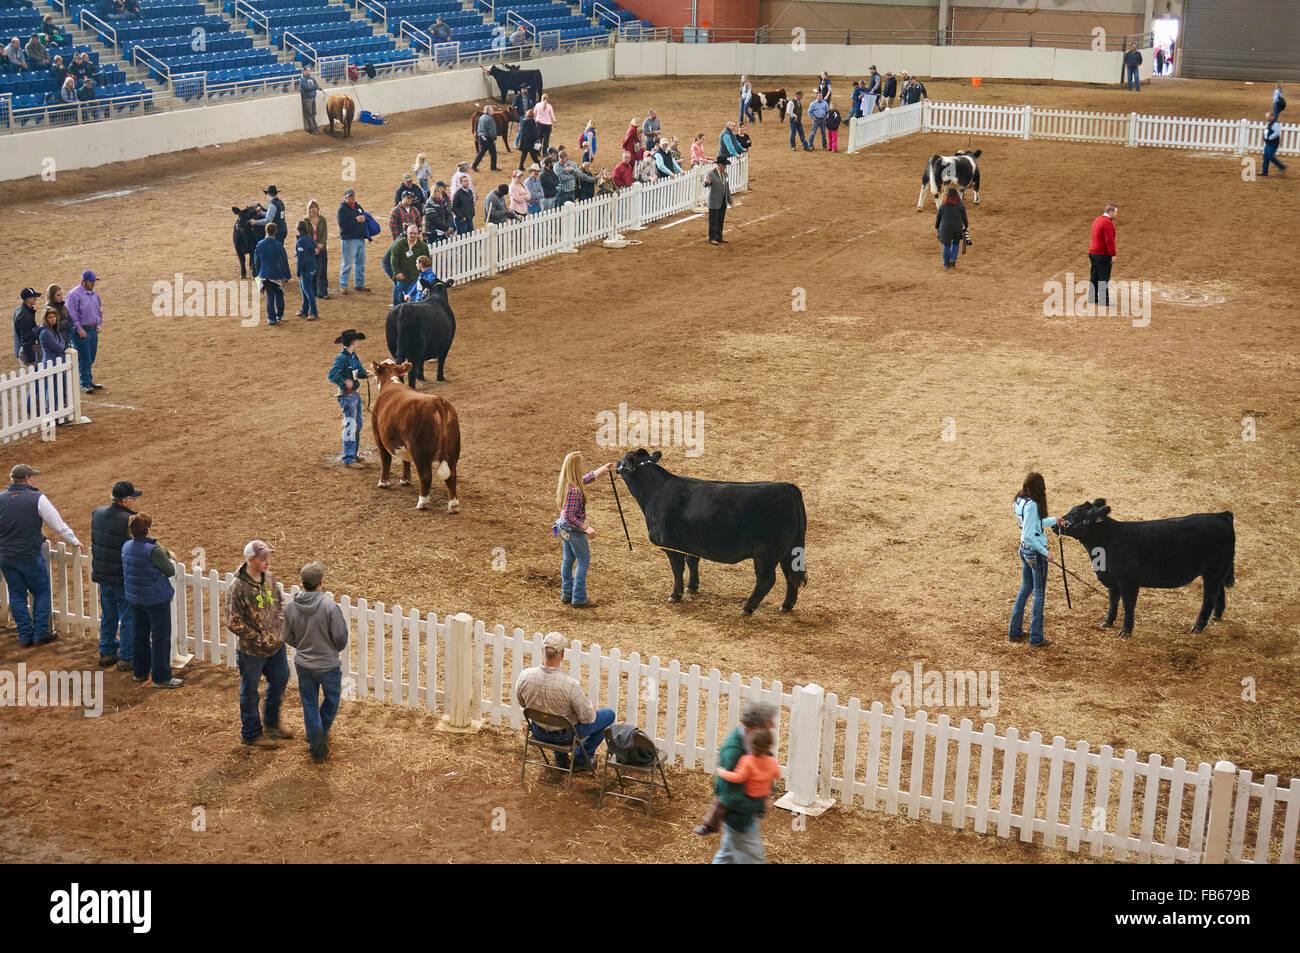 Show Cow Stockfotos & Show Cow Bilder - Alamy